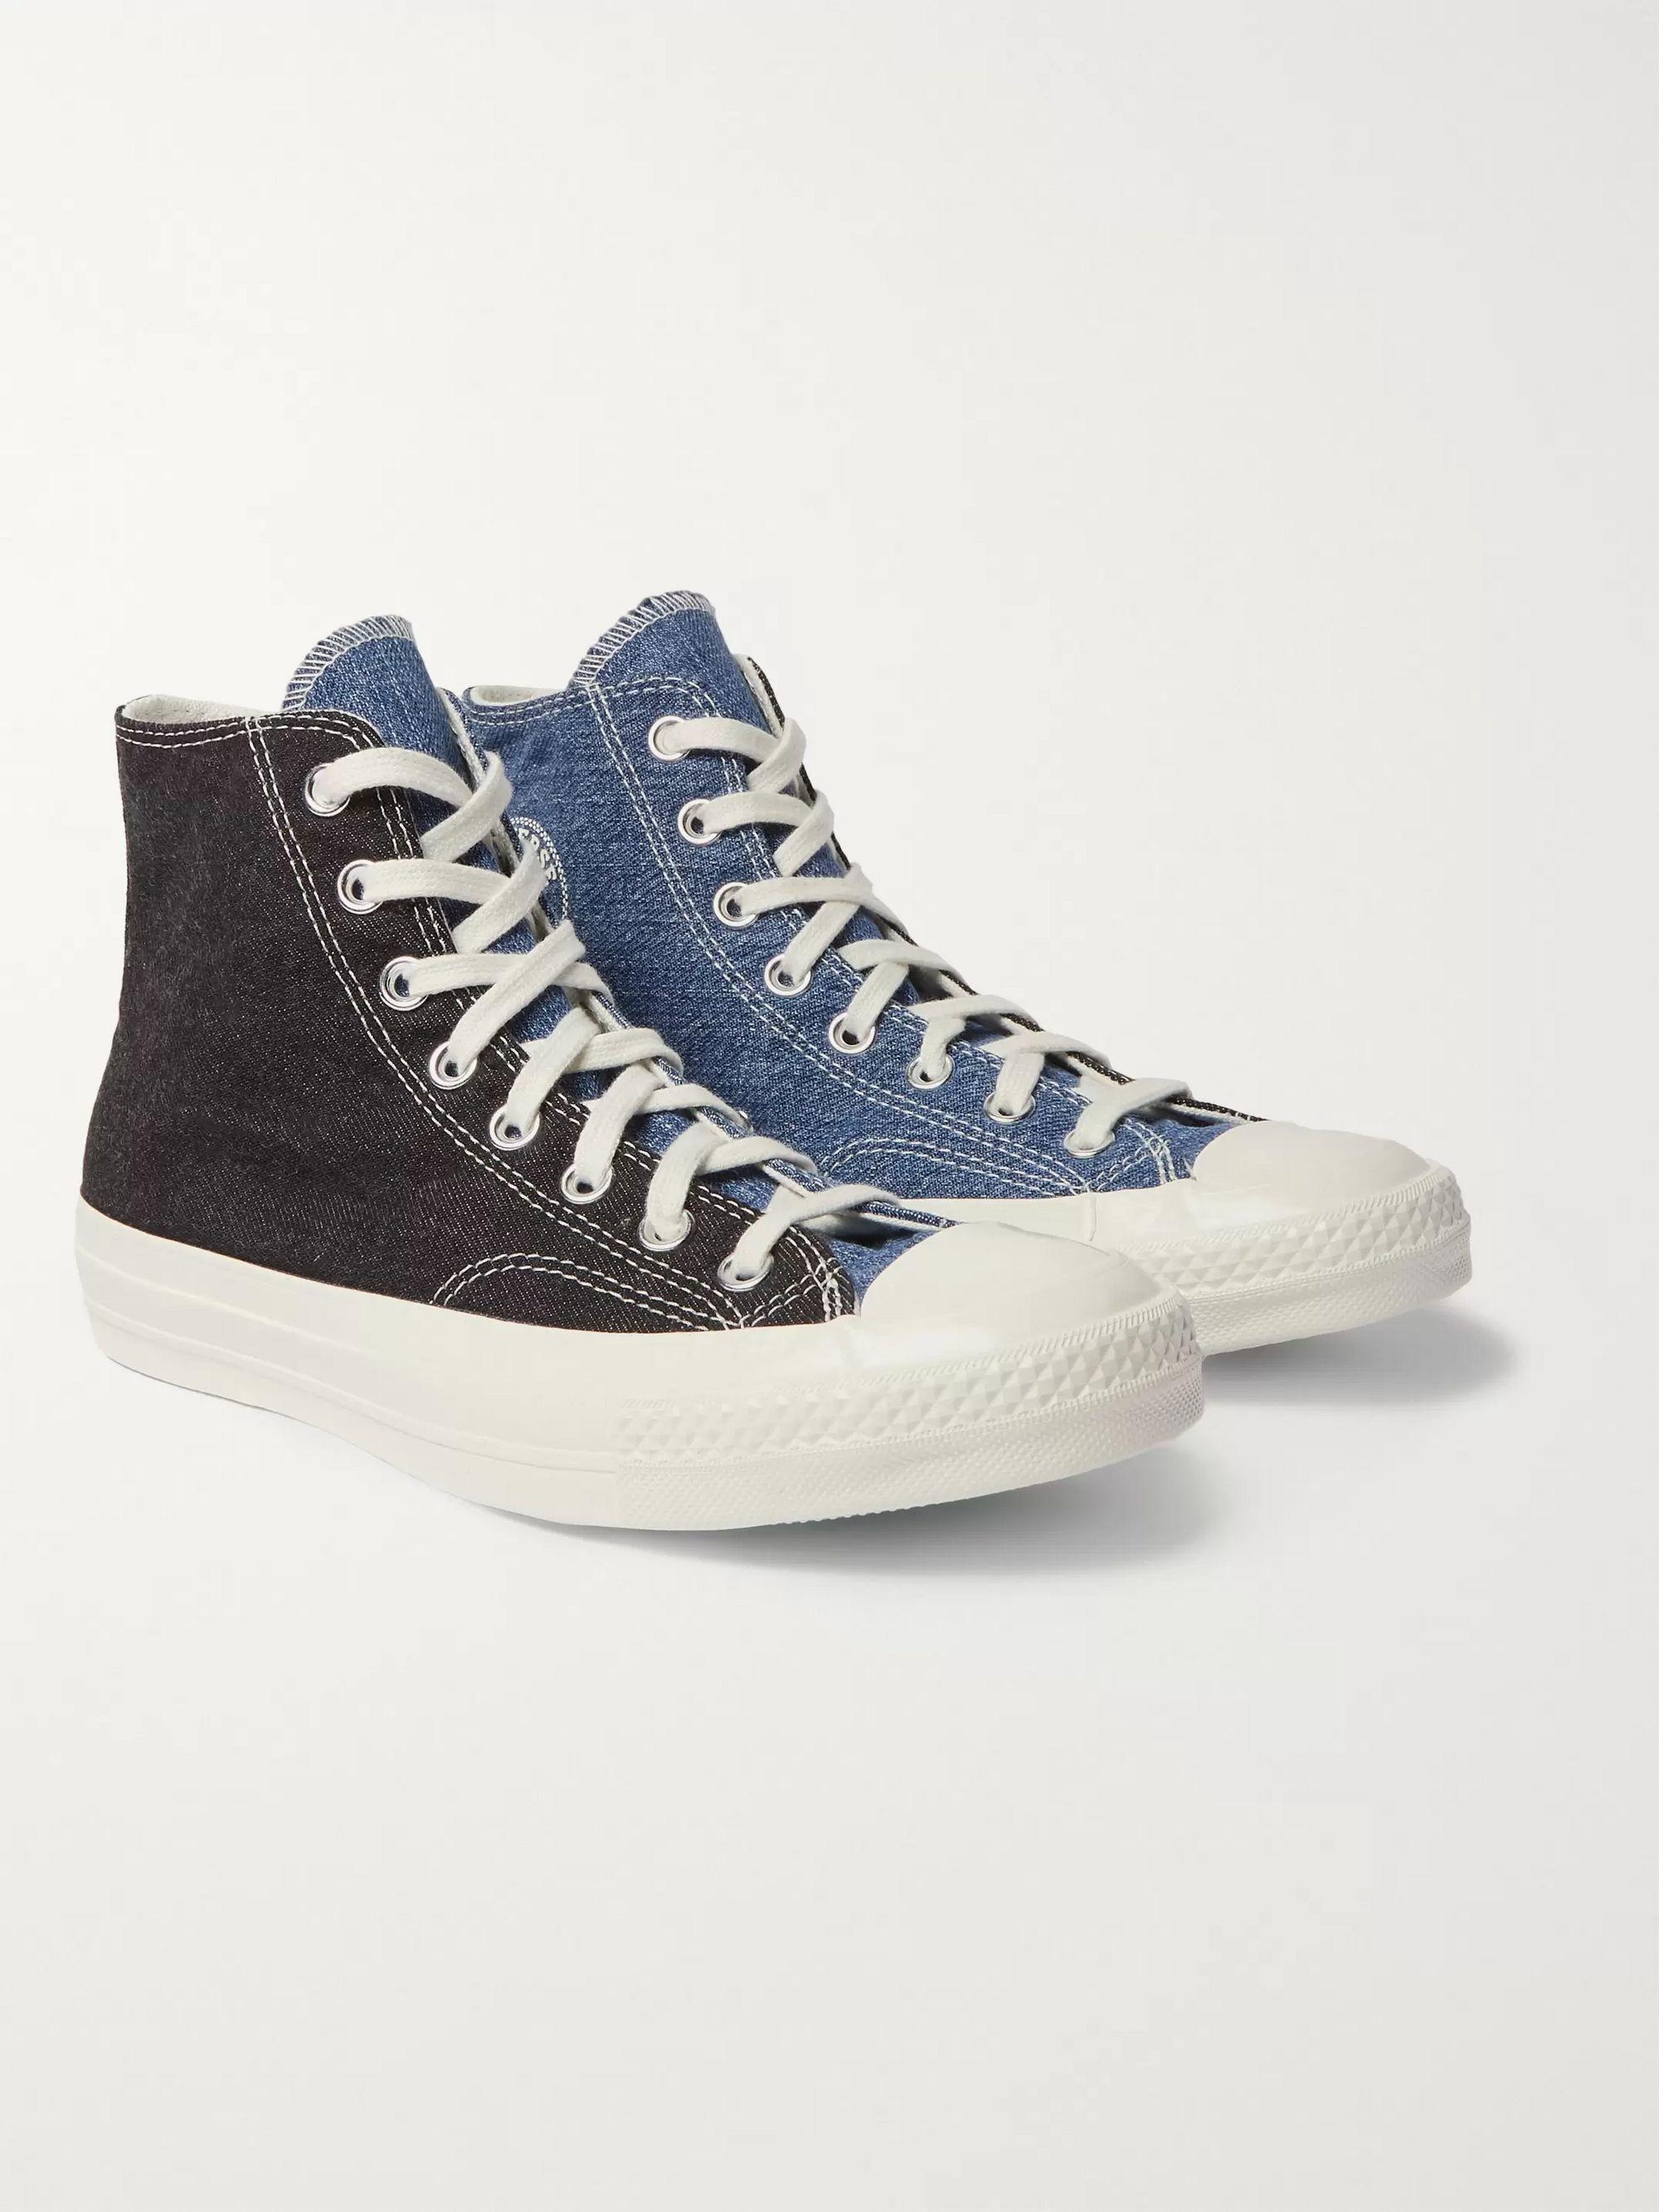 Chuck Taylor All Star 70 Denim High Top Sneakers